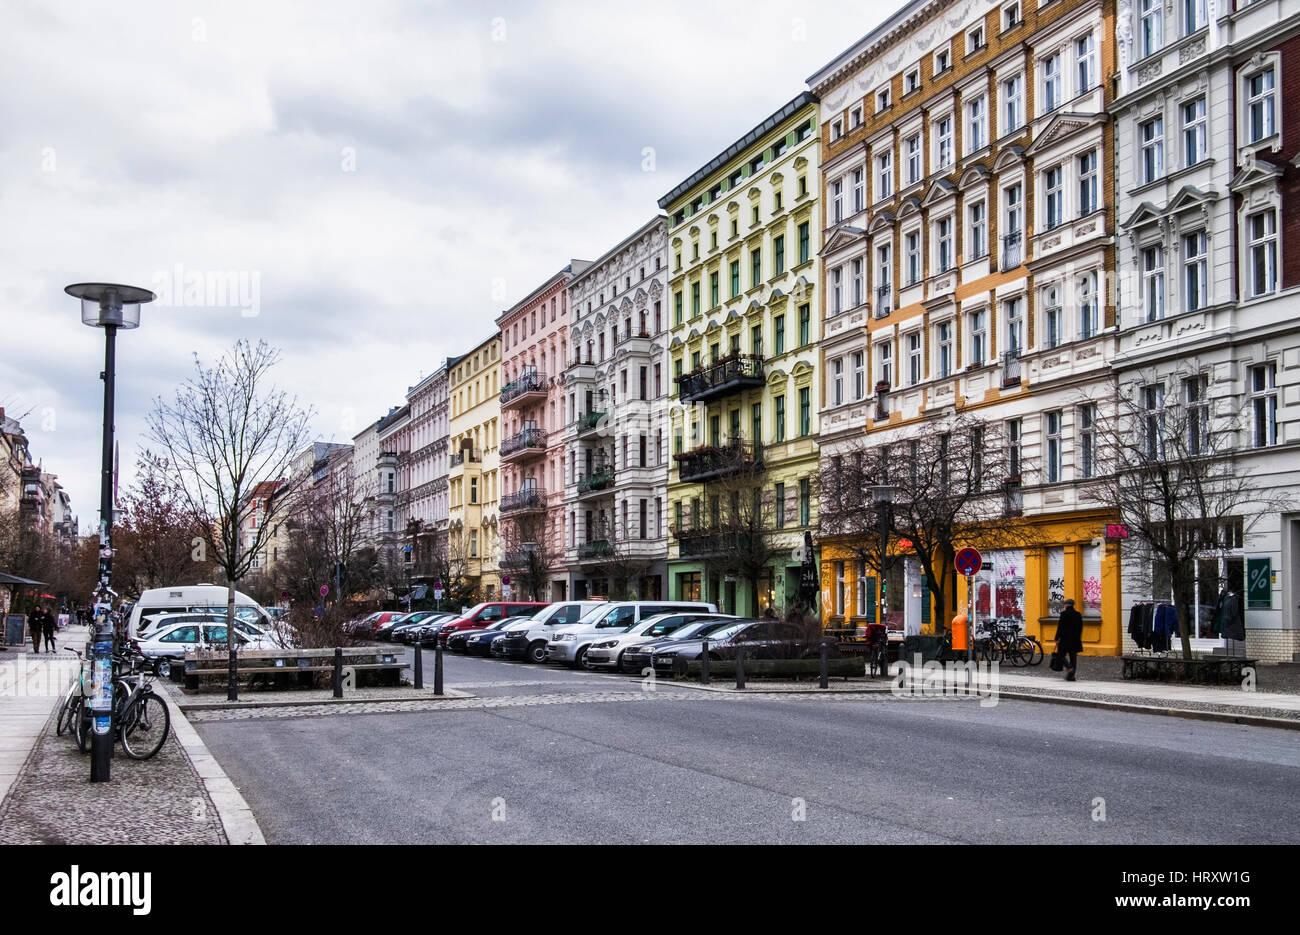 Berlin, Prenzlauer Berg., Elegant old refurbished apartment buildings. Typical Traditional homes in Oderberger strasse - Stock Image